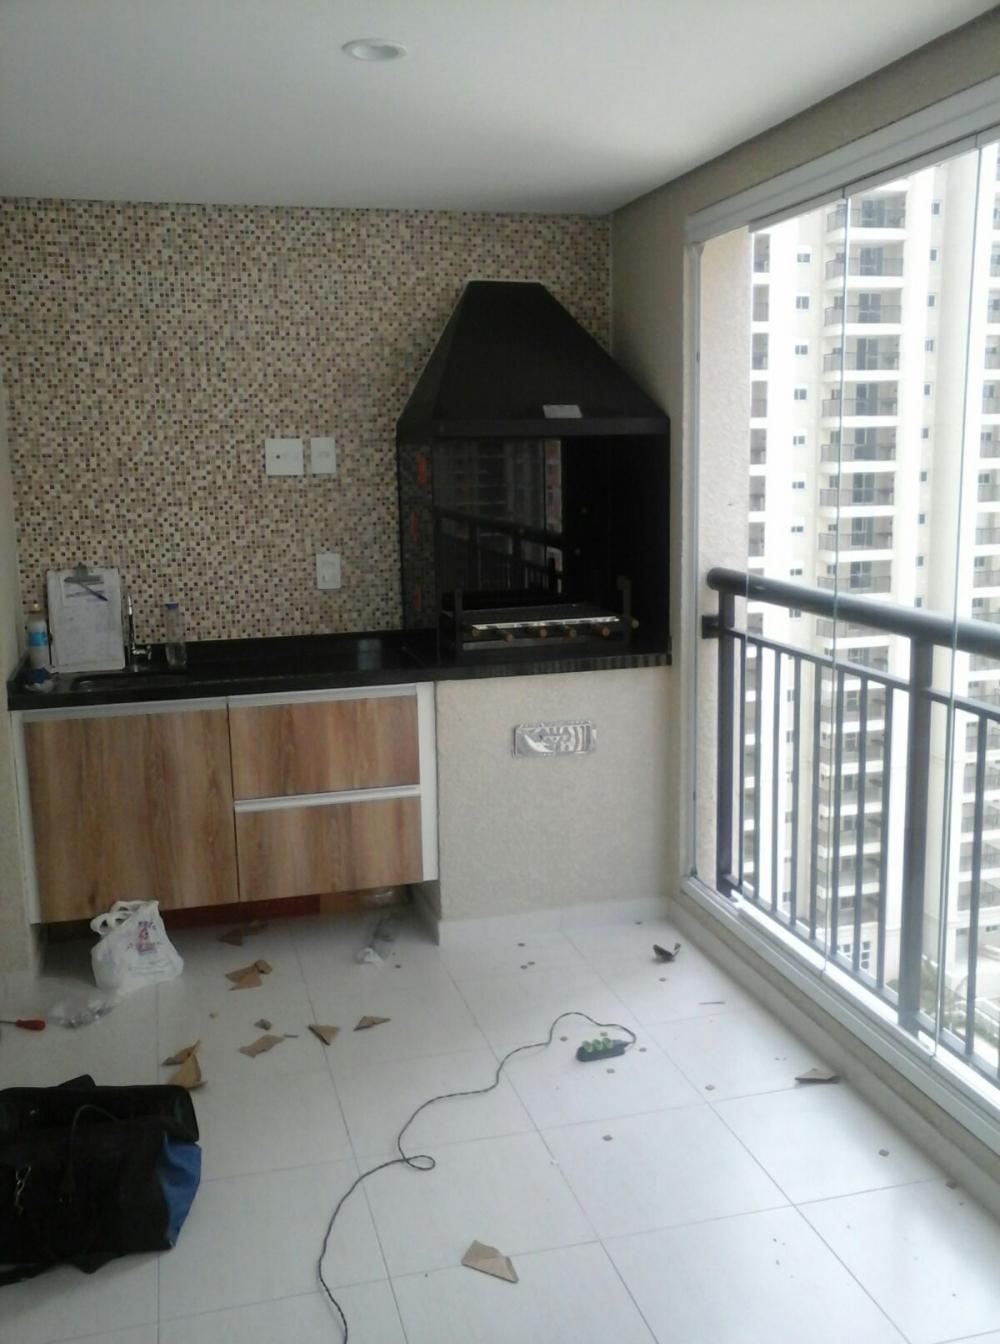 Vidro Serigrafado Branco Preço na Vila Guilherme - Vidro Serigrafado na Cozinha